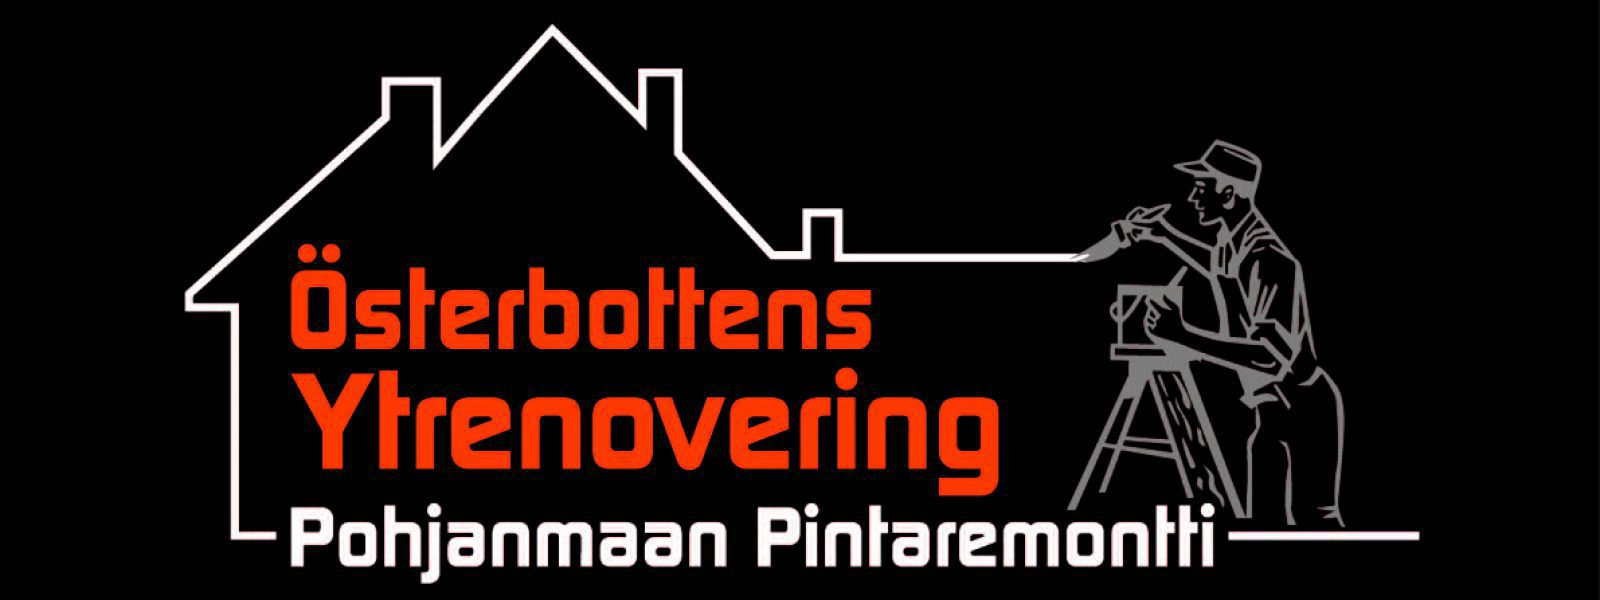 Österbottens Ytrenovering – Pohjanmaan Pintaremontti